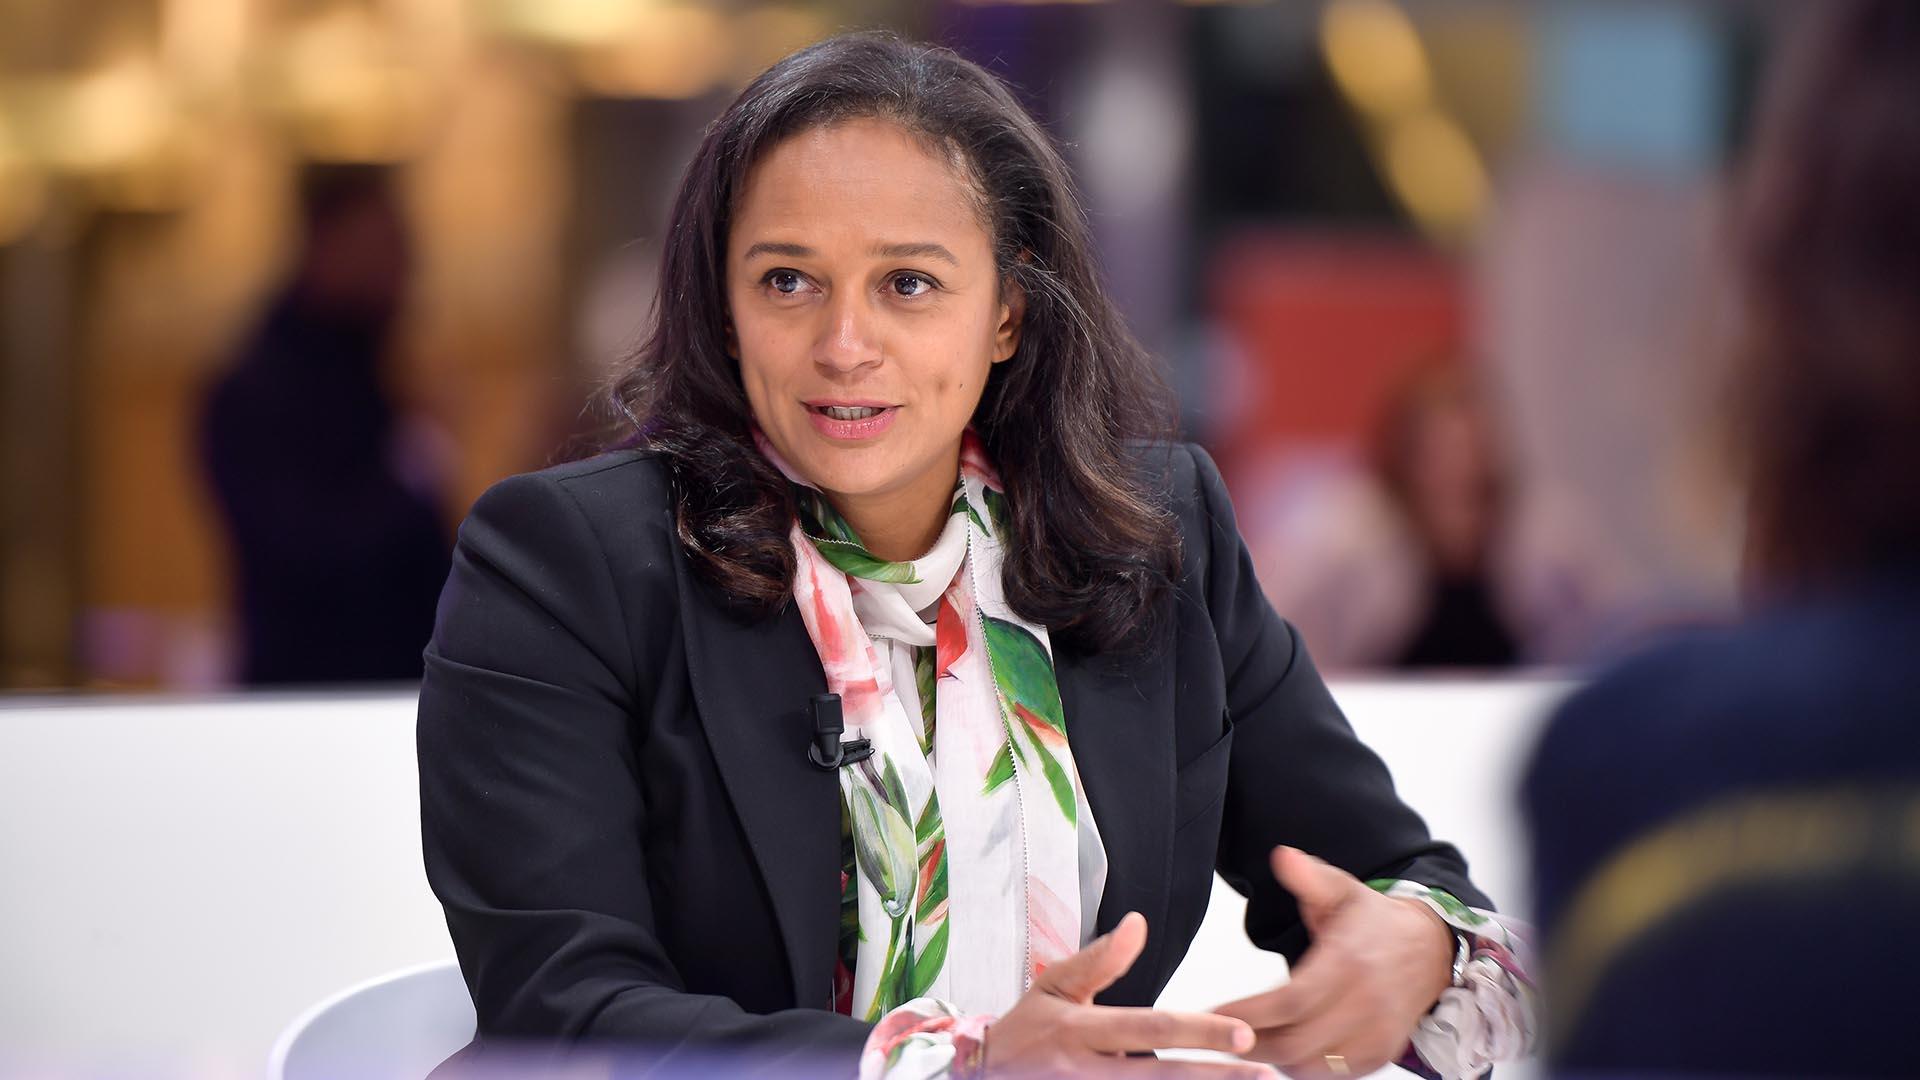 Sérgio Raimundo garante que estado angolano nunca conseguirá prender Isabel a empresária